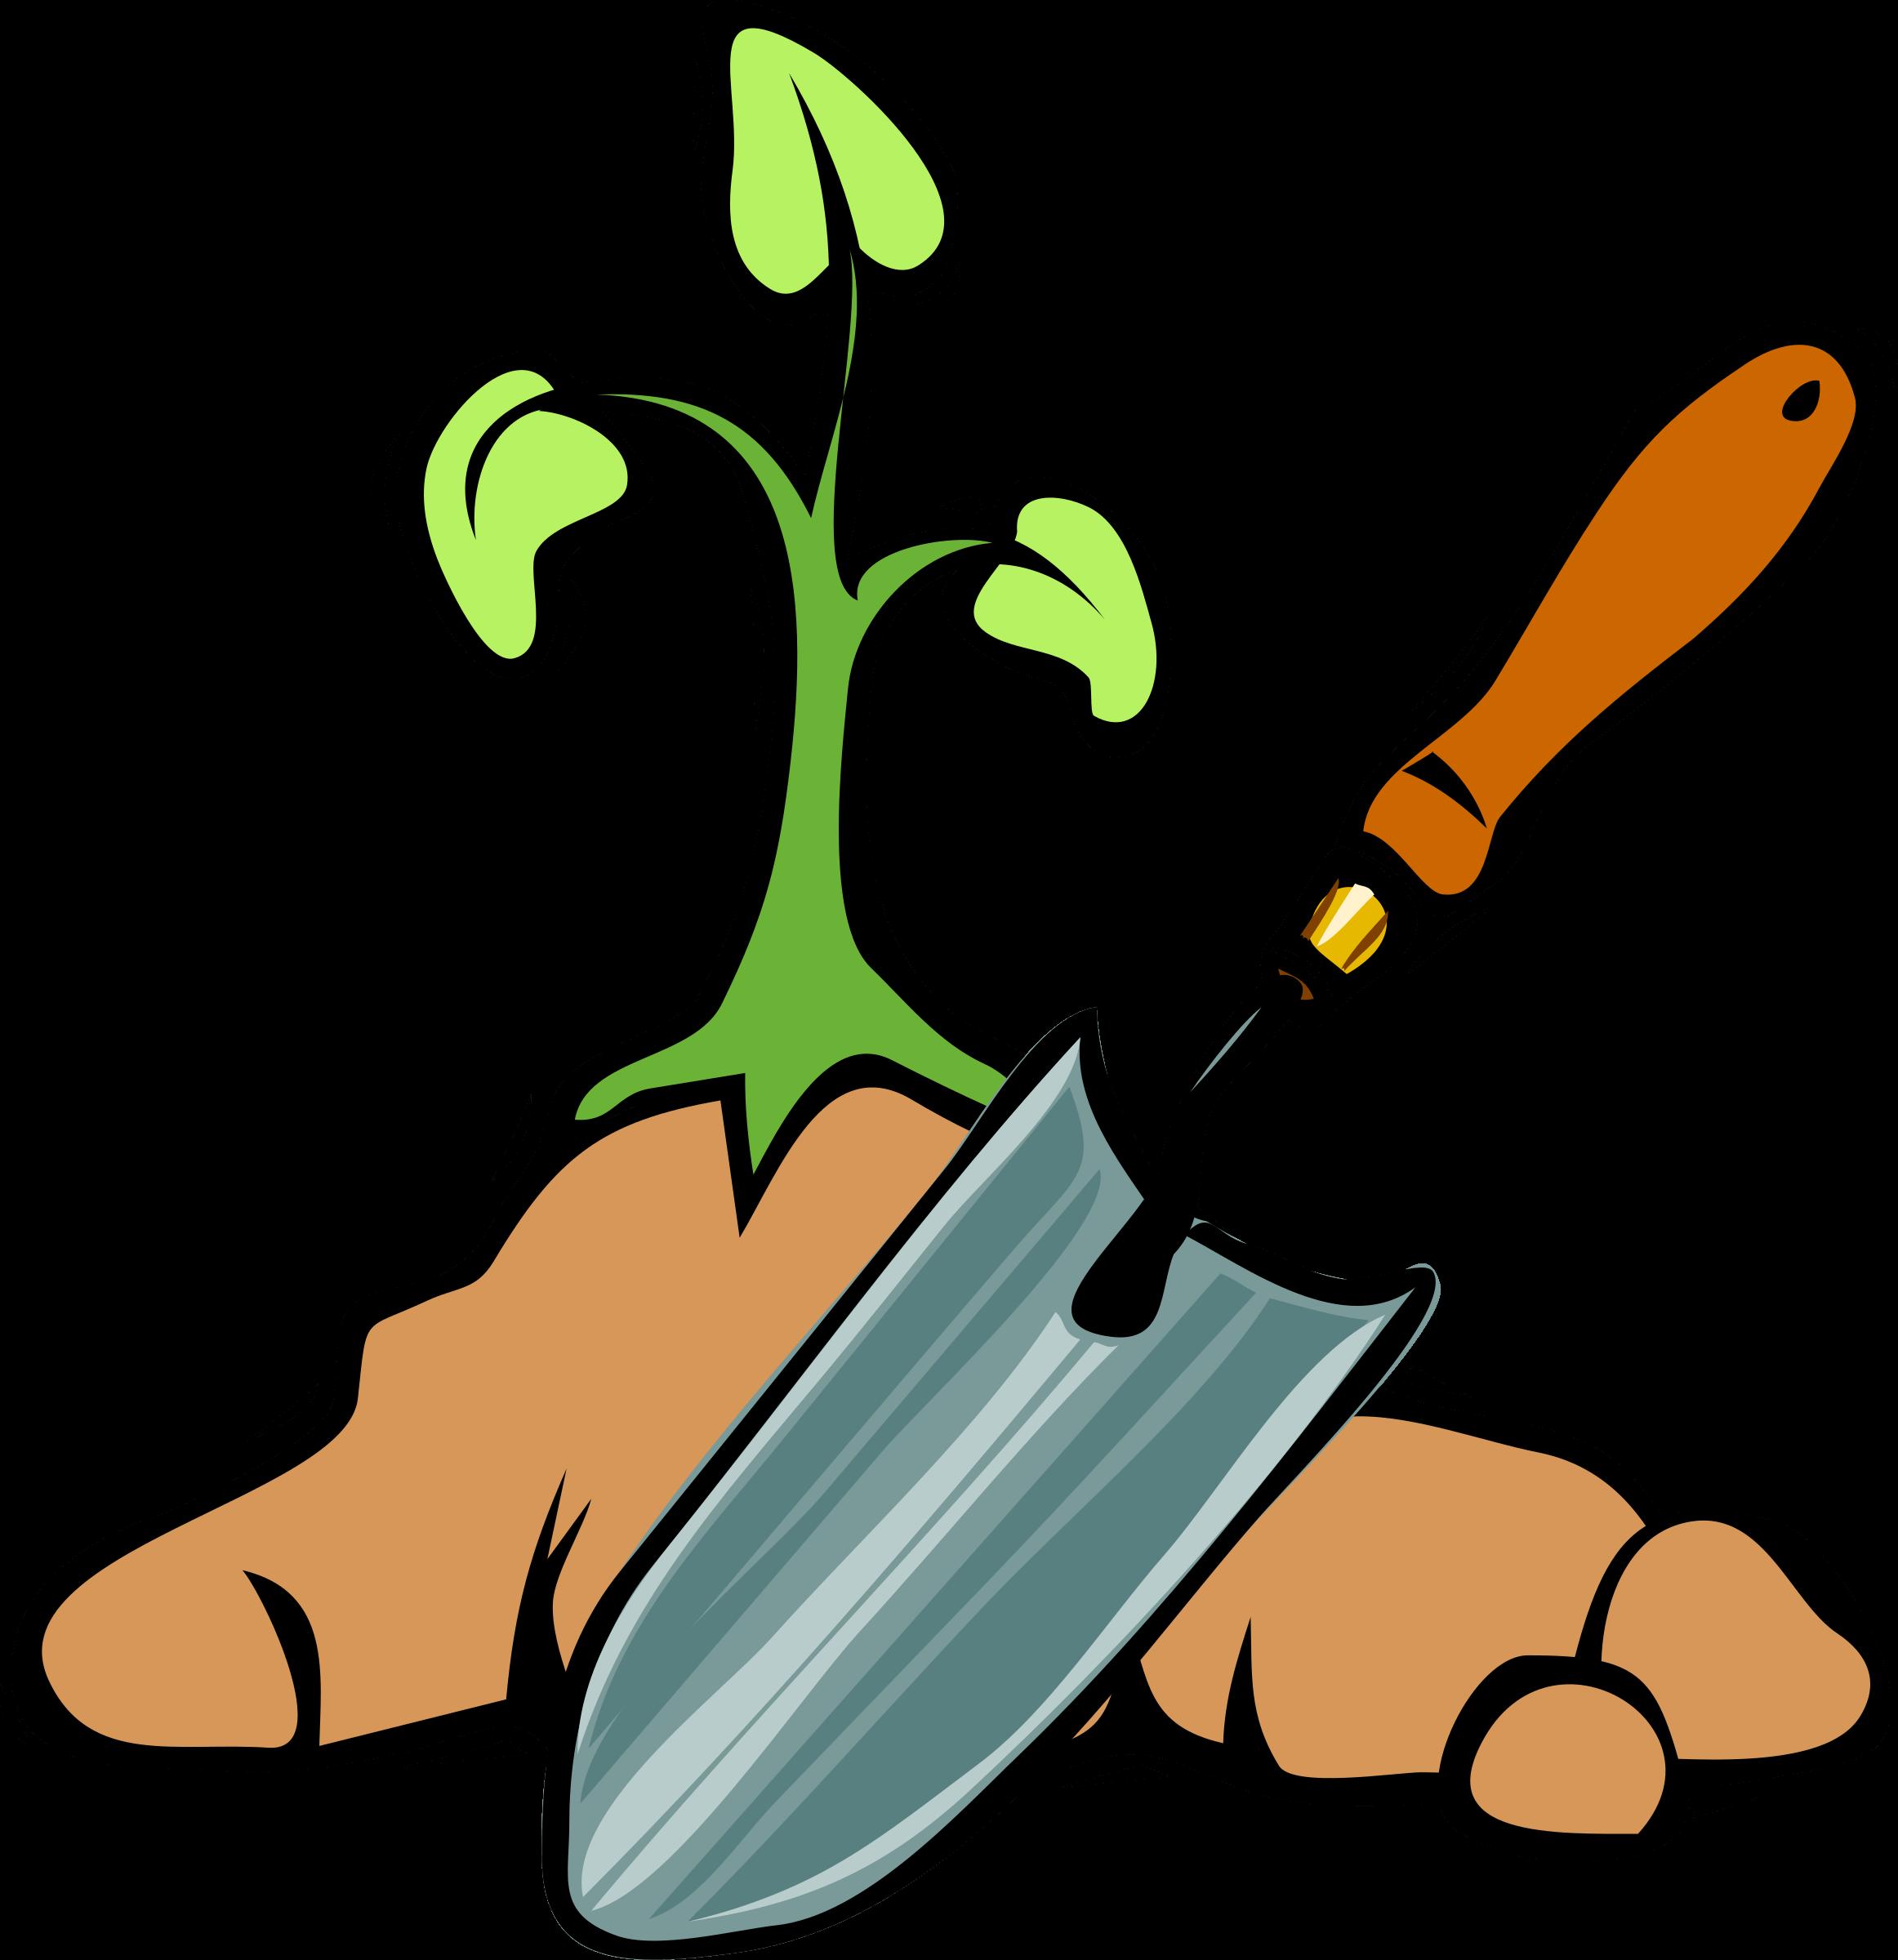 Gardener clipart animated. Free gardening image graphics